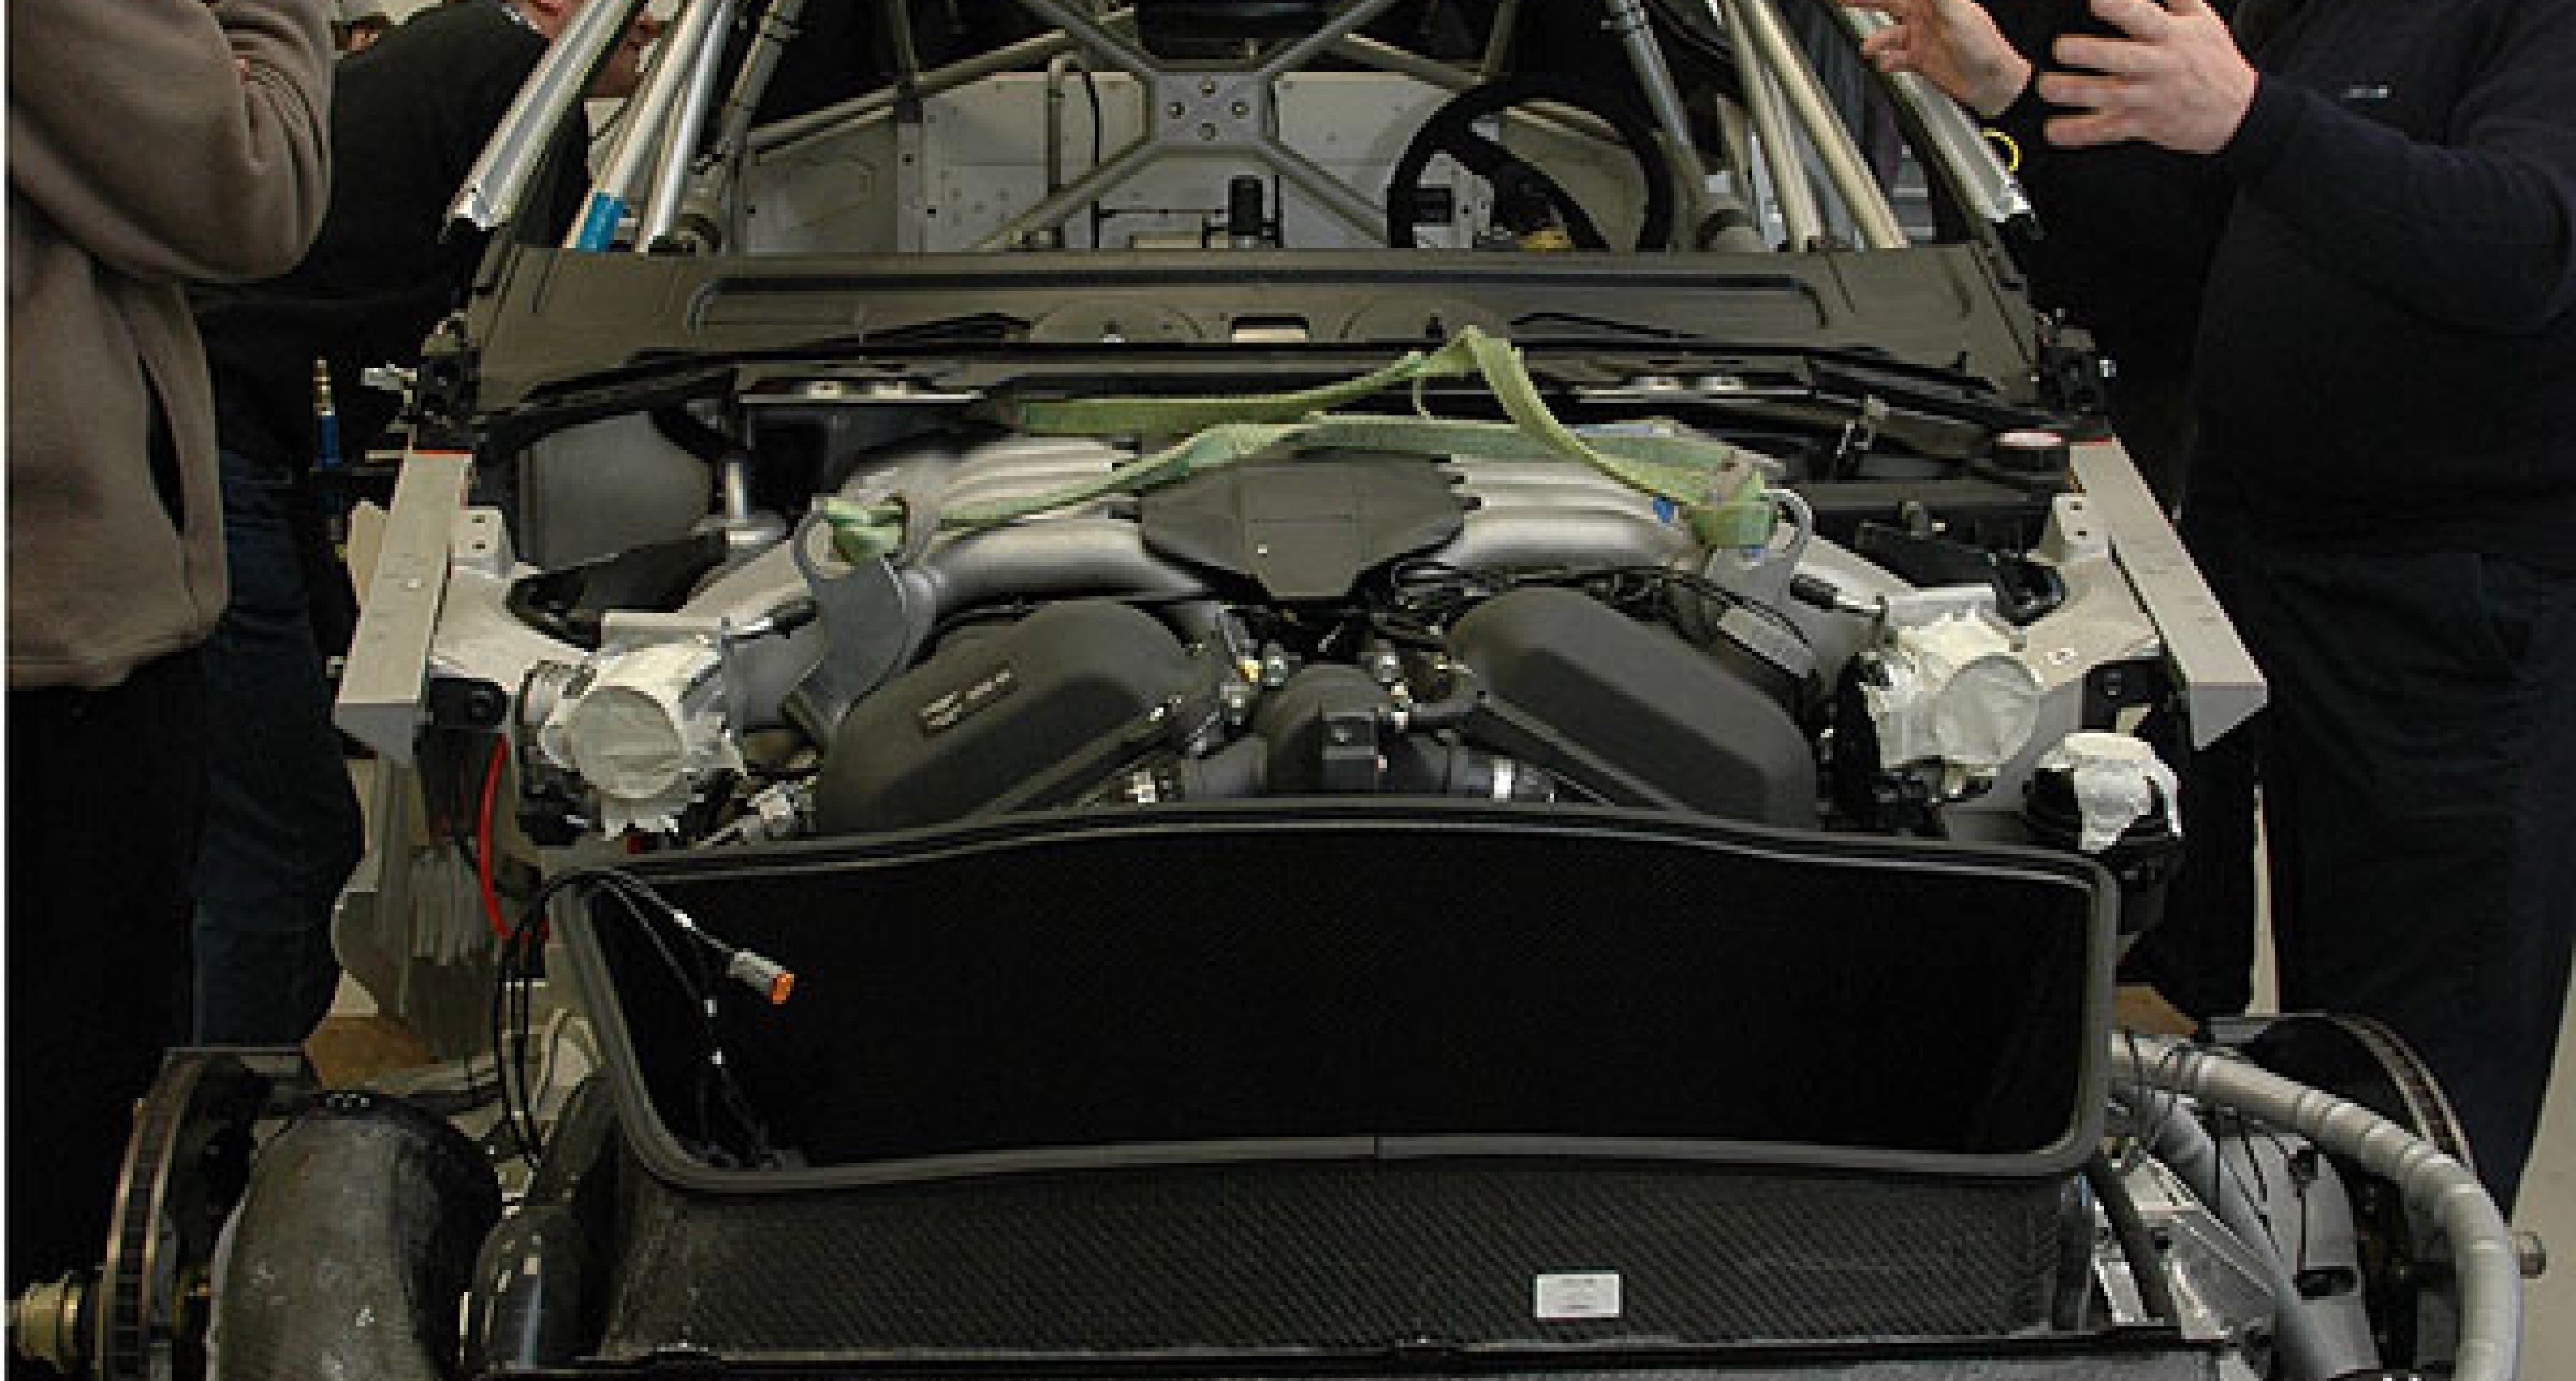 Aston Martin DBRS9 - the inside story